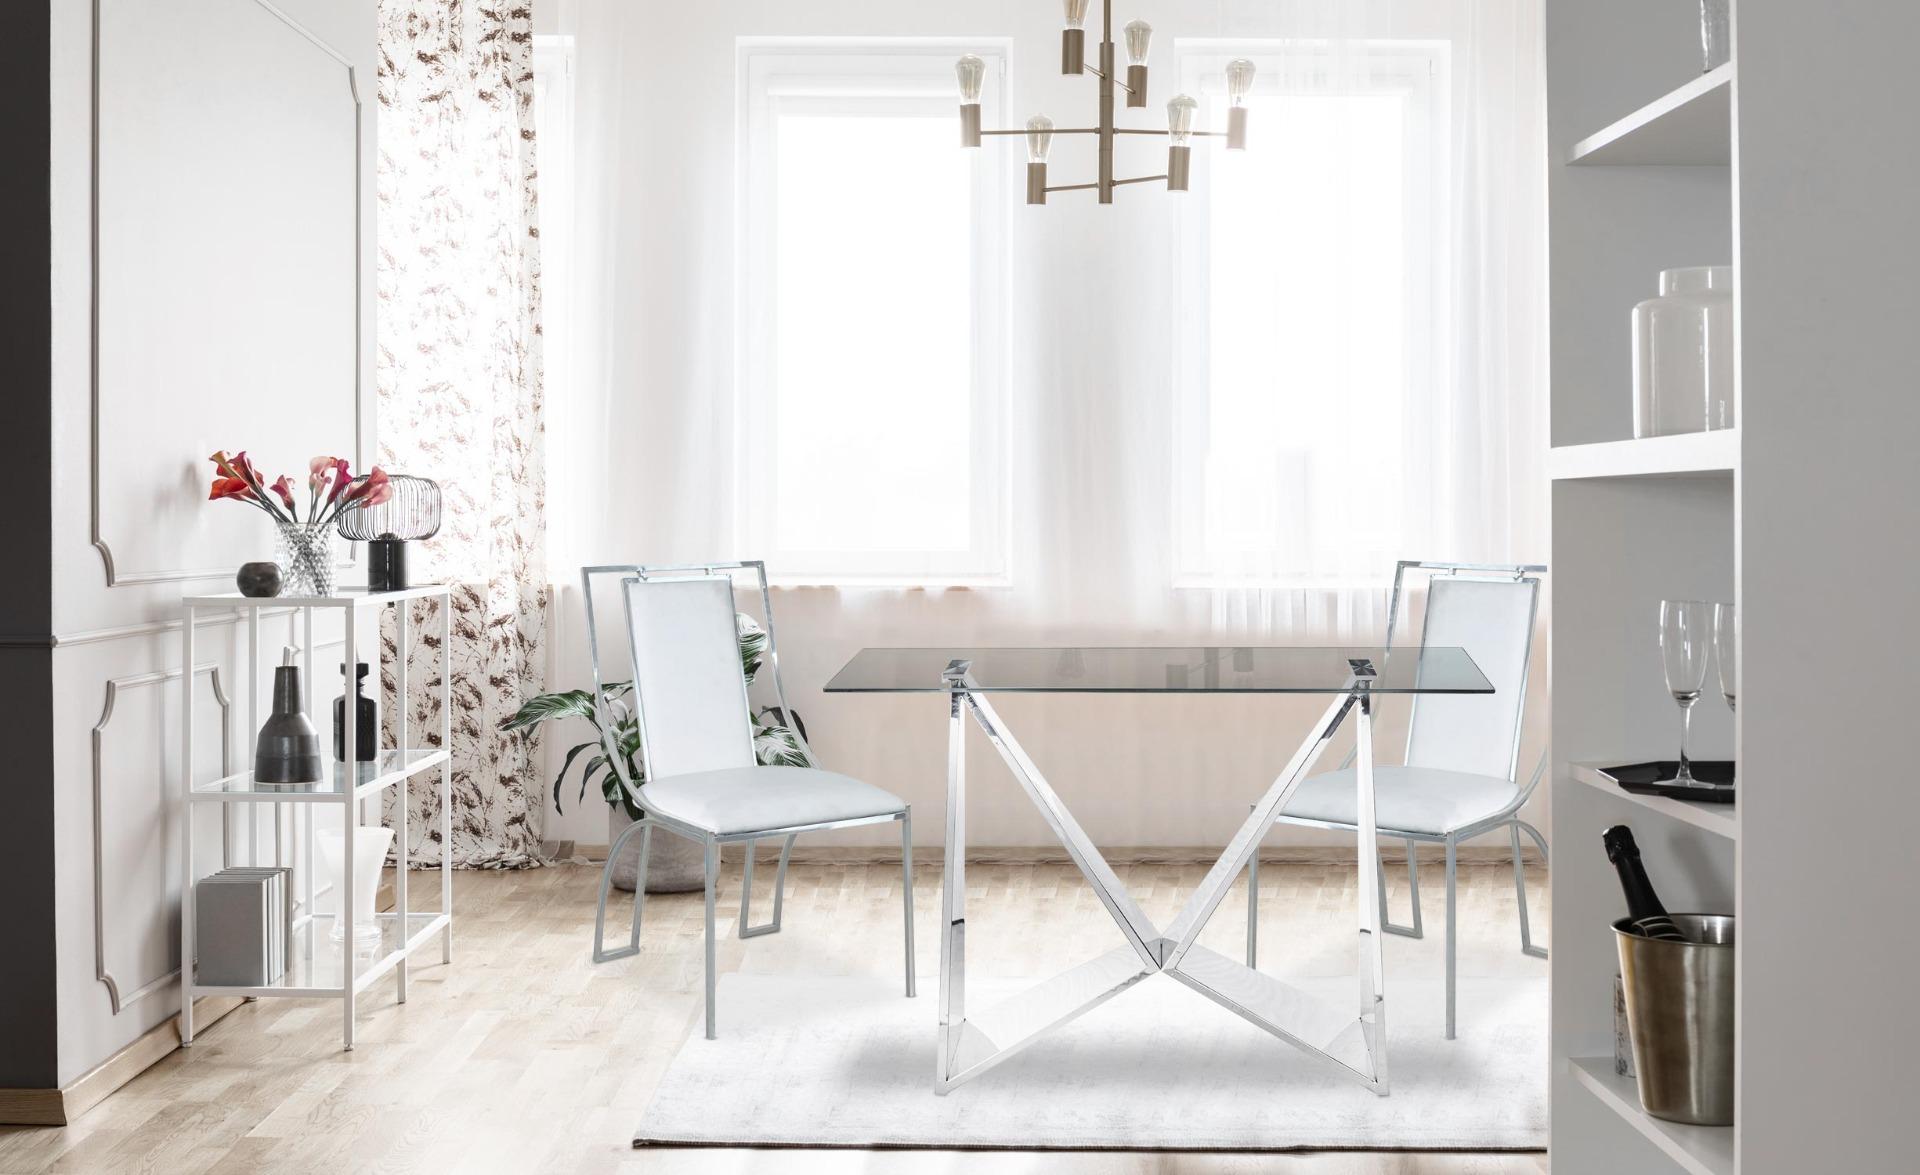 Set di 2 sedie Catarina similpelle PU Bianco con gambe argentate